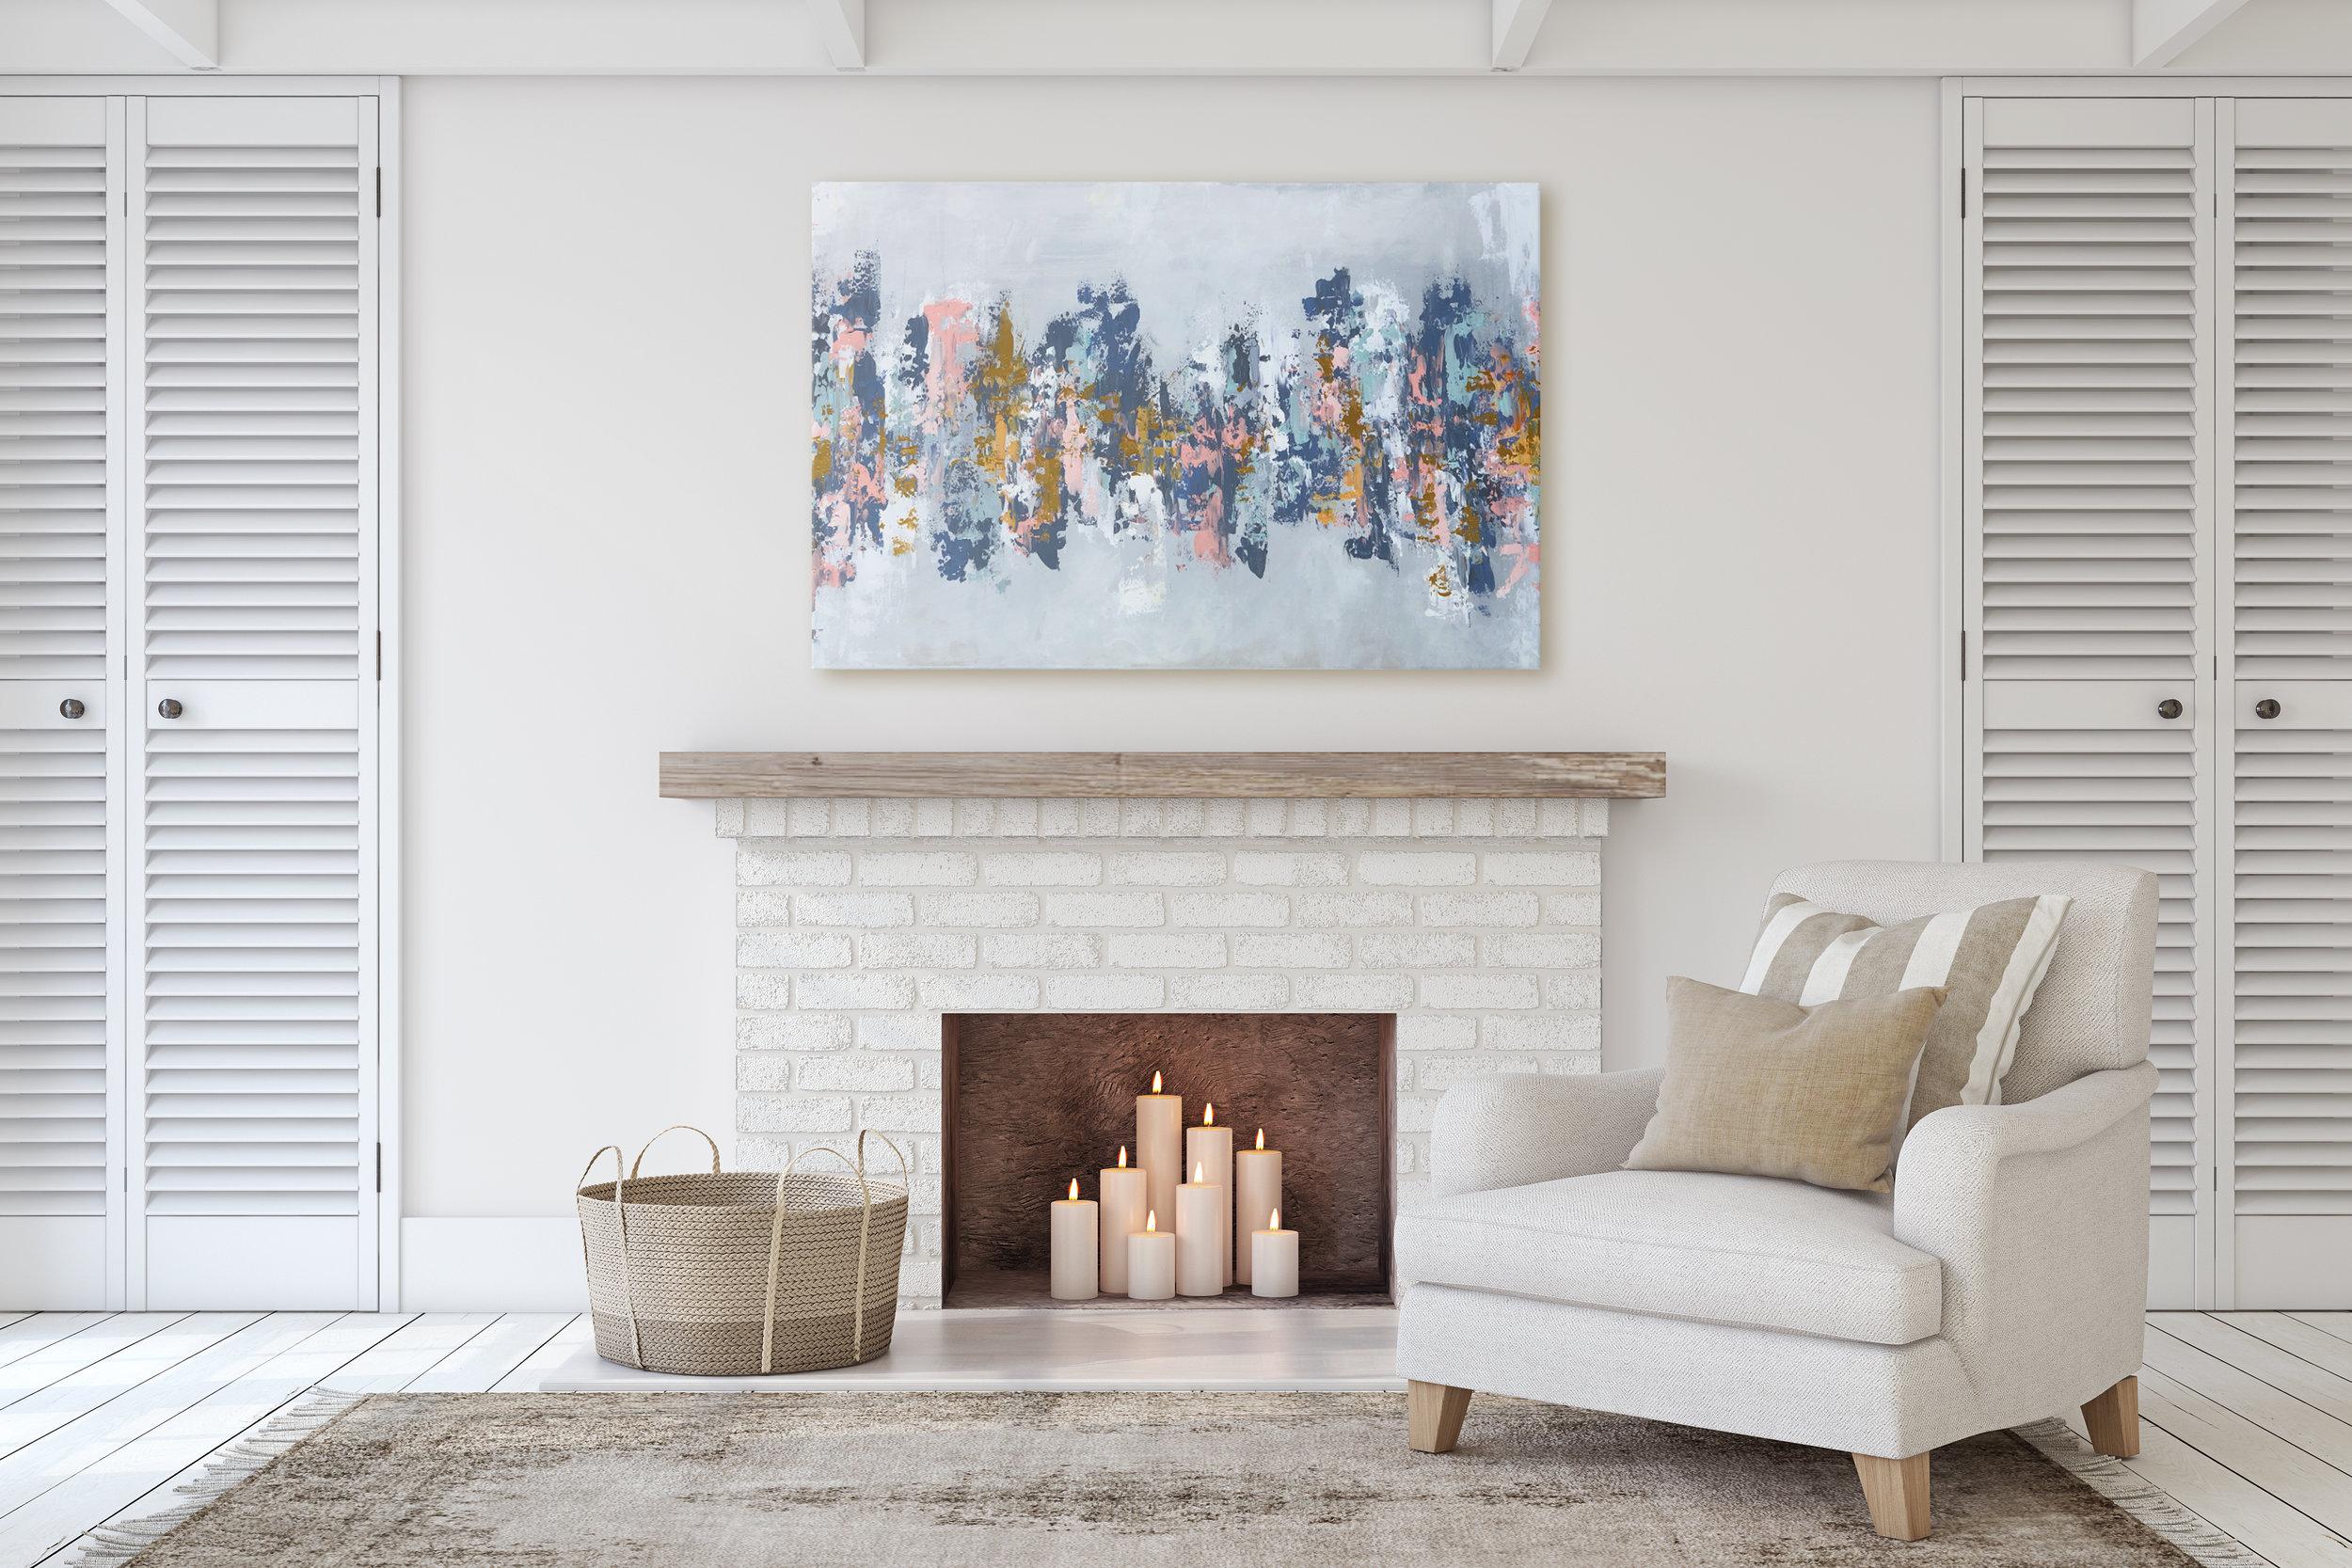 Fireplace_CANVAS1.jpg